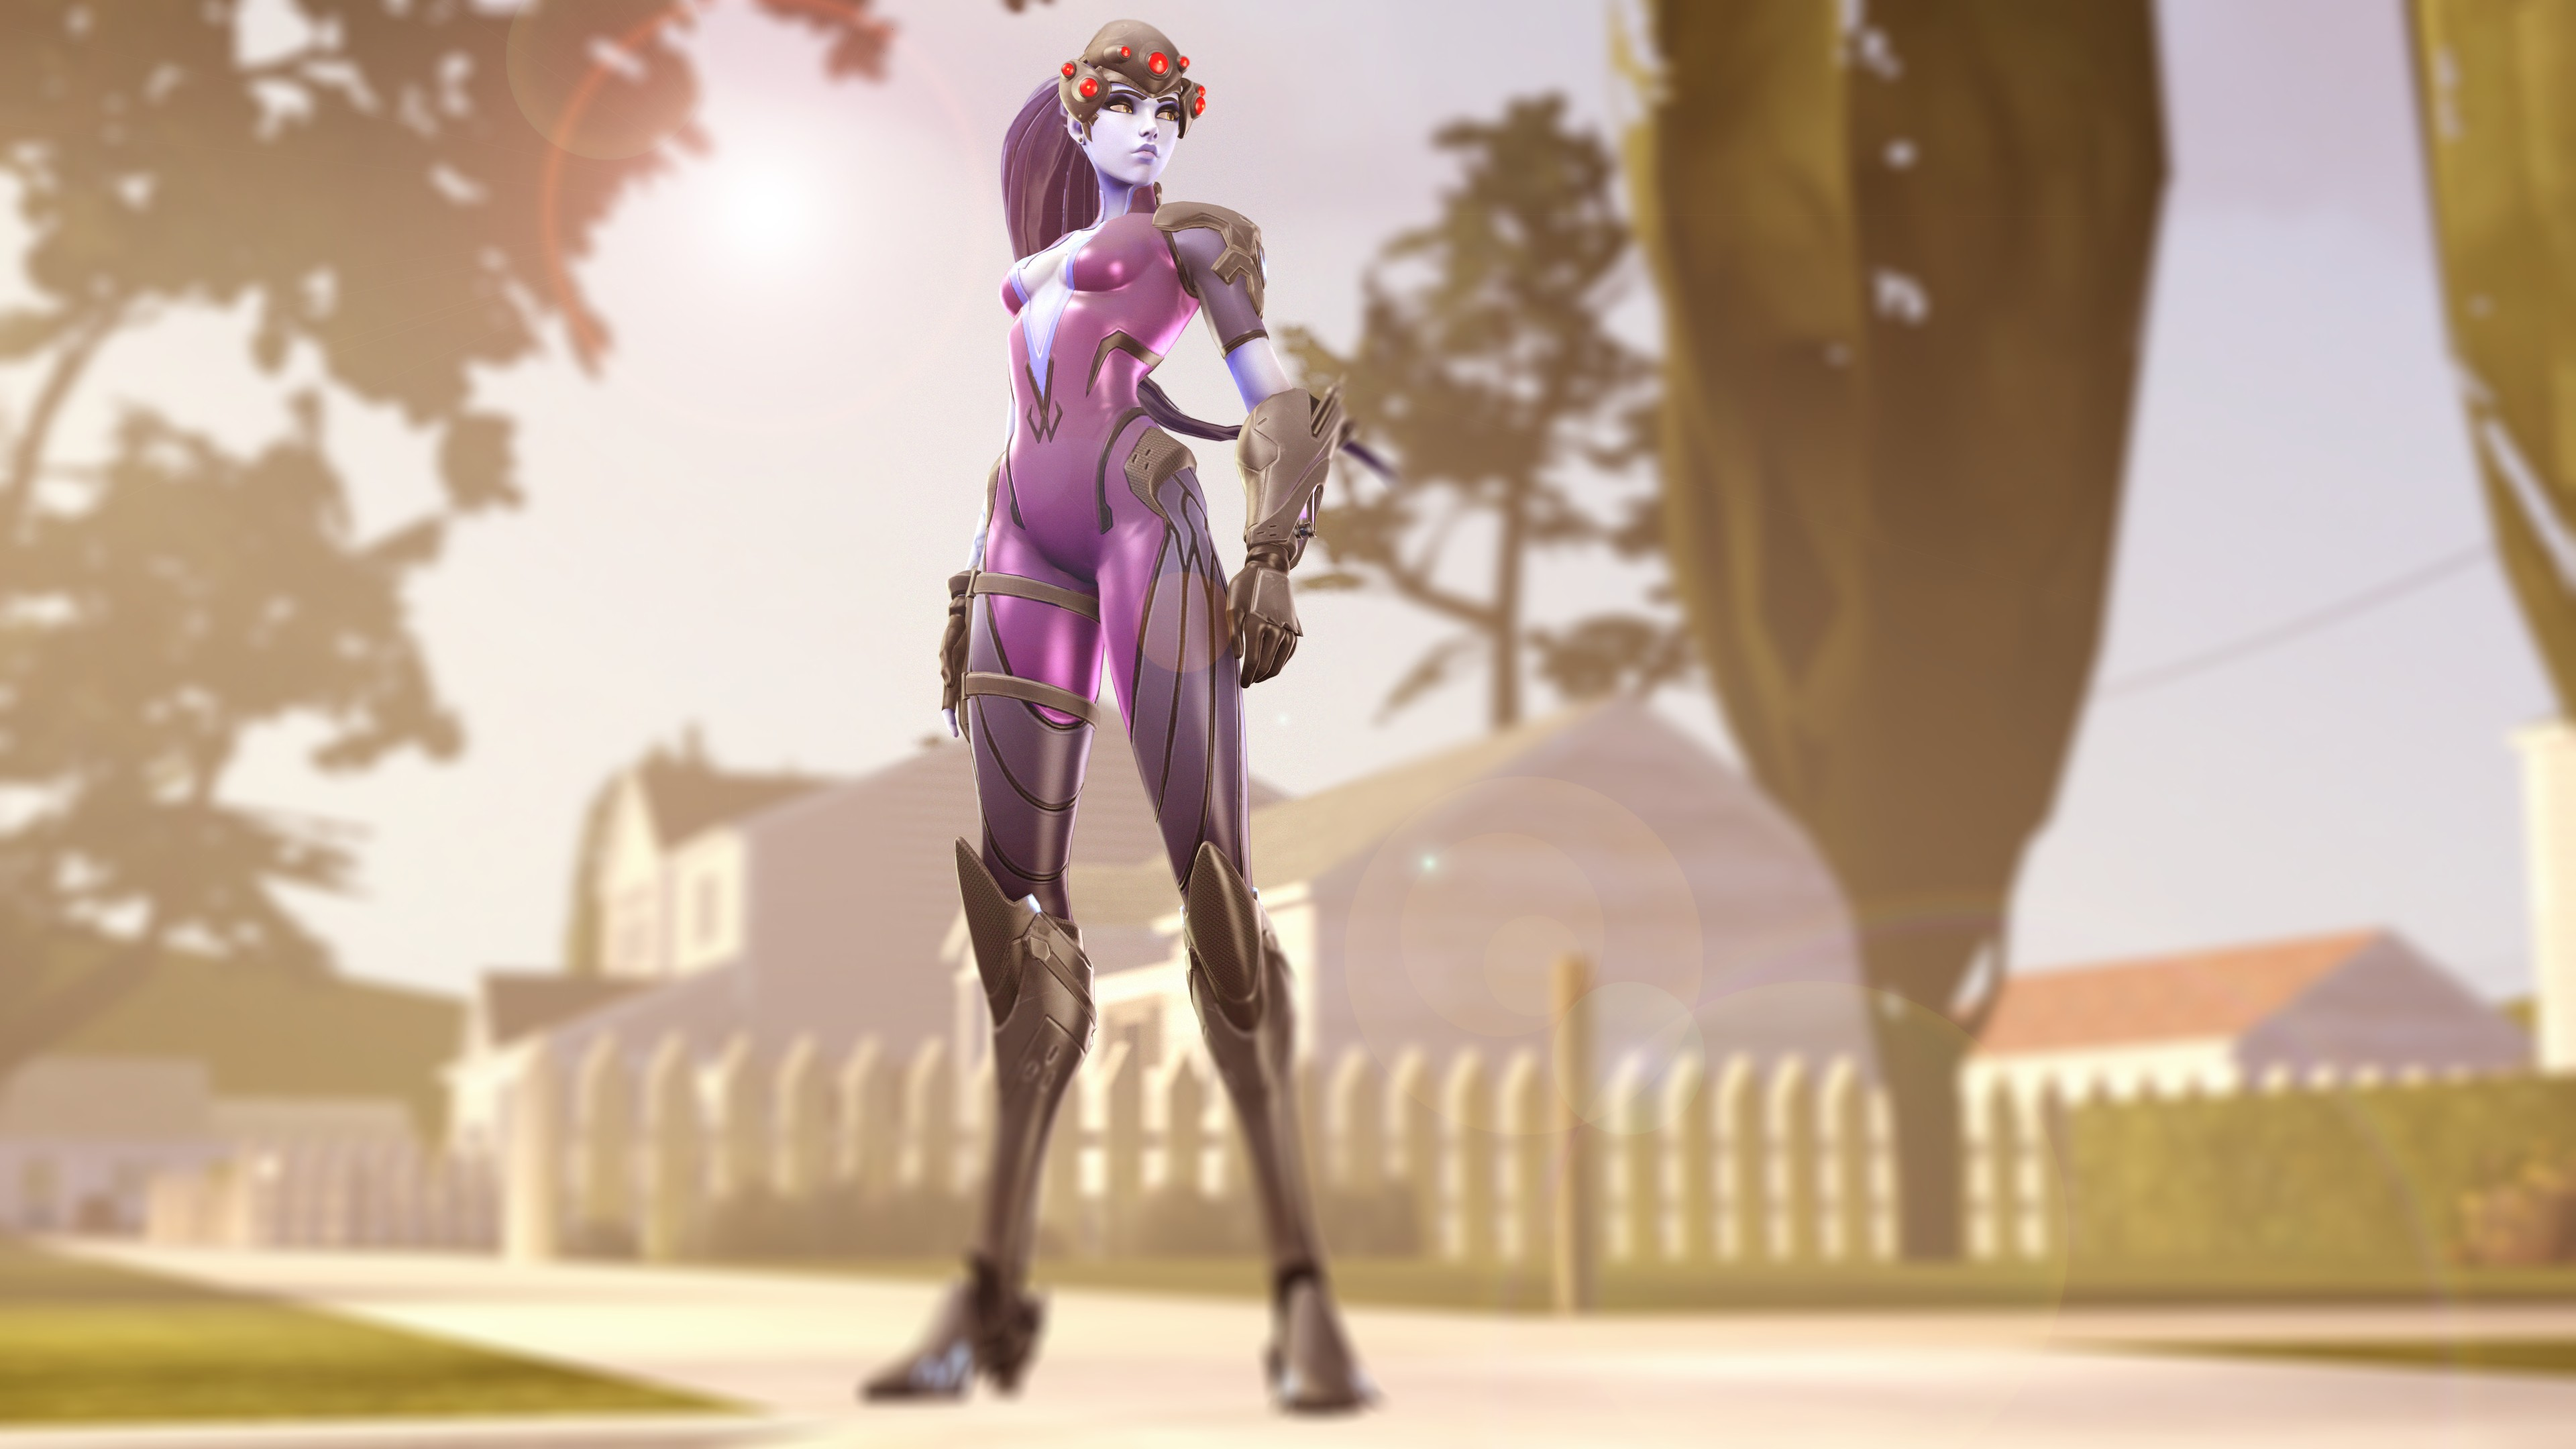 Overwatch Widowmaker Wallpaper 183 ① Download Free Beautiful